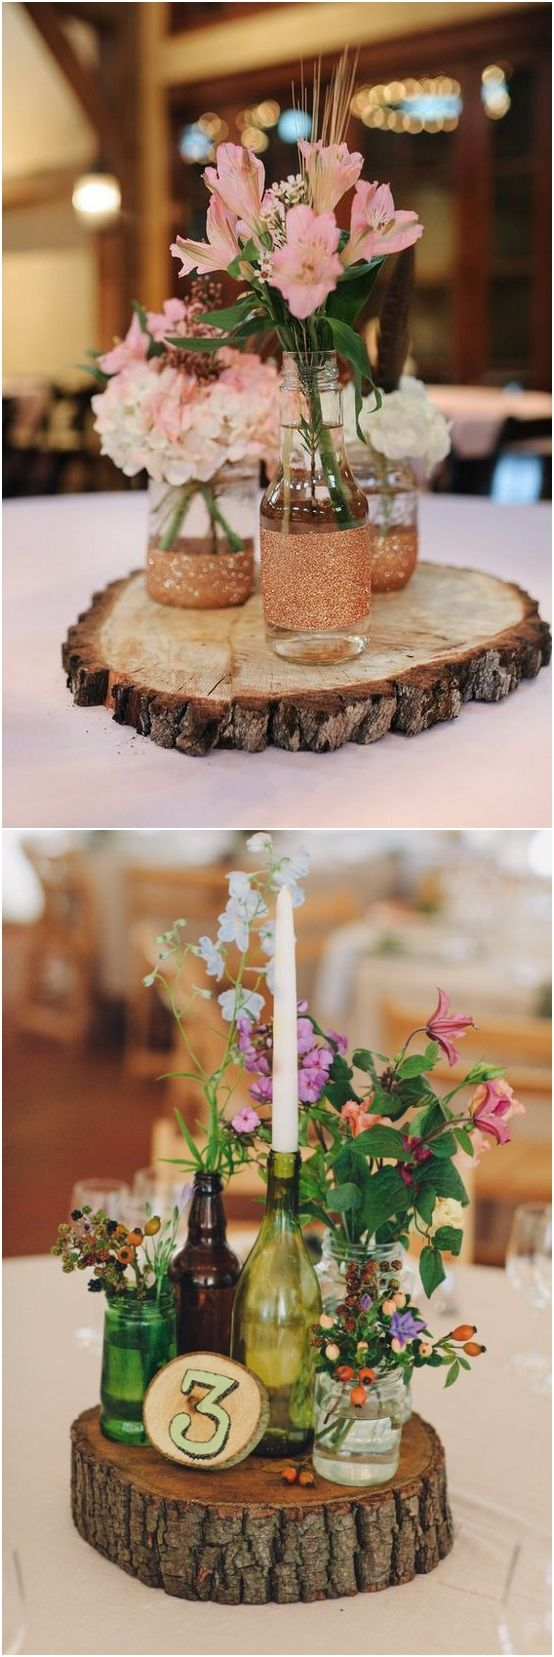 Best 25 tree stump centerpiece ideas on pinterest wooden best 25 tree stump centerpiece ideas on pinterest wooden centerpieces rustic centre pieces and wedding table decorations reviewsmspy